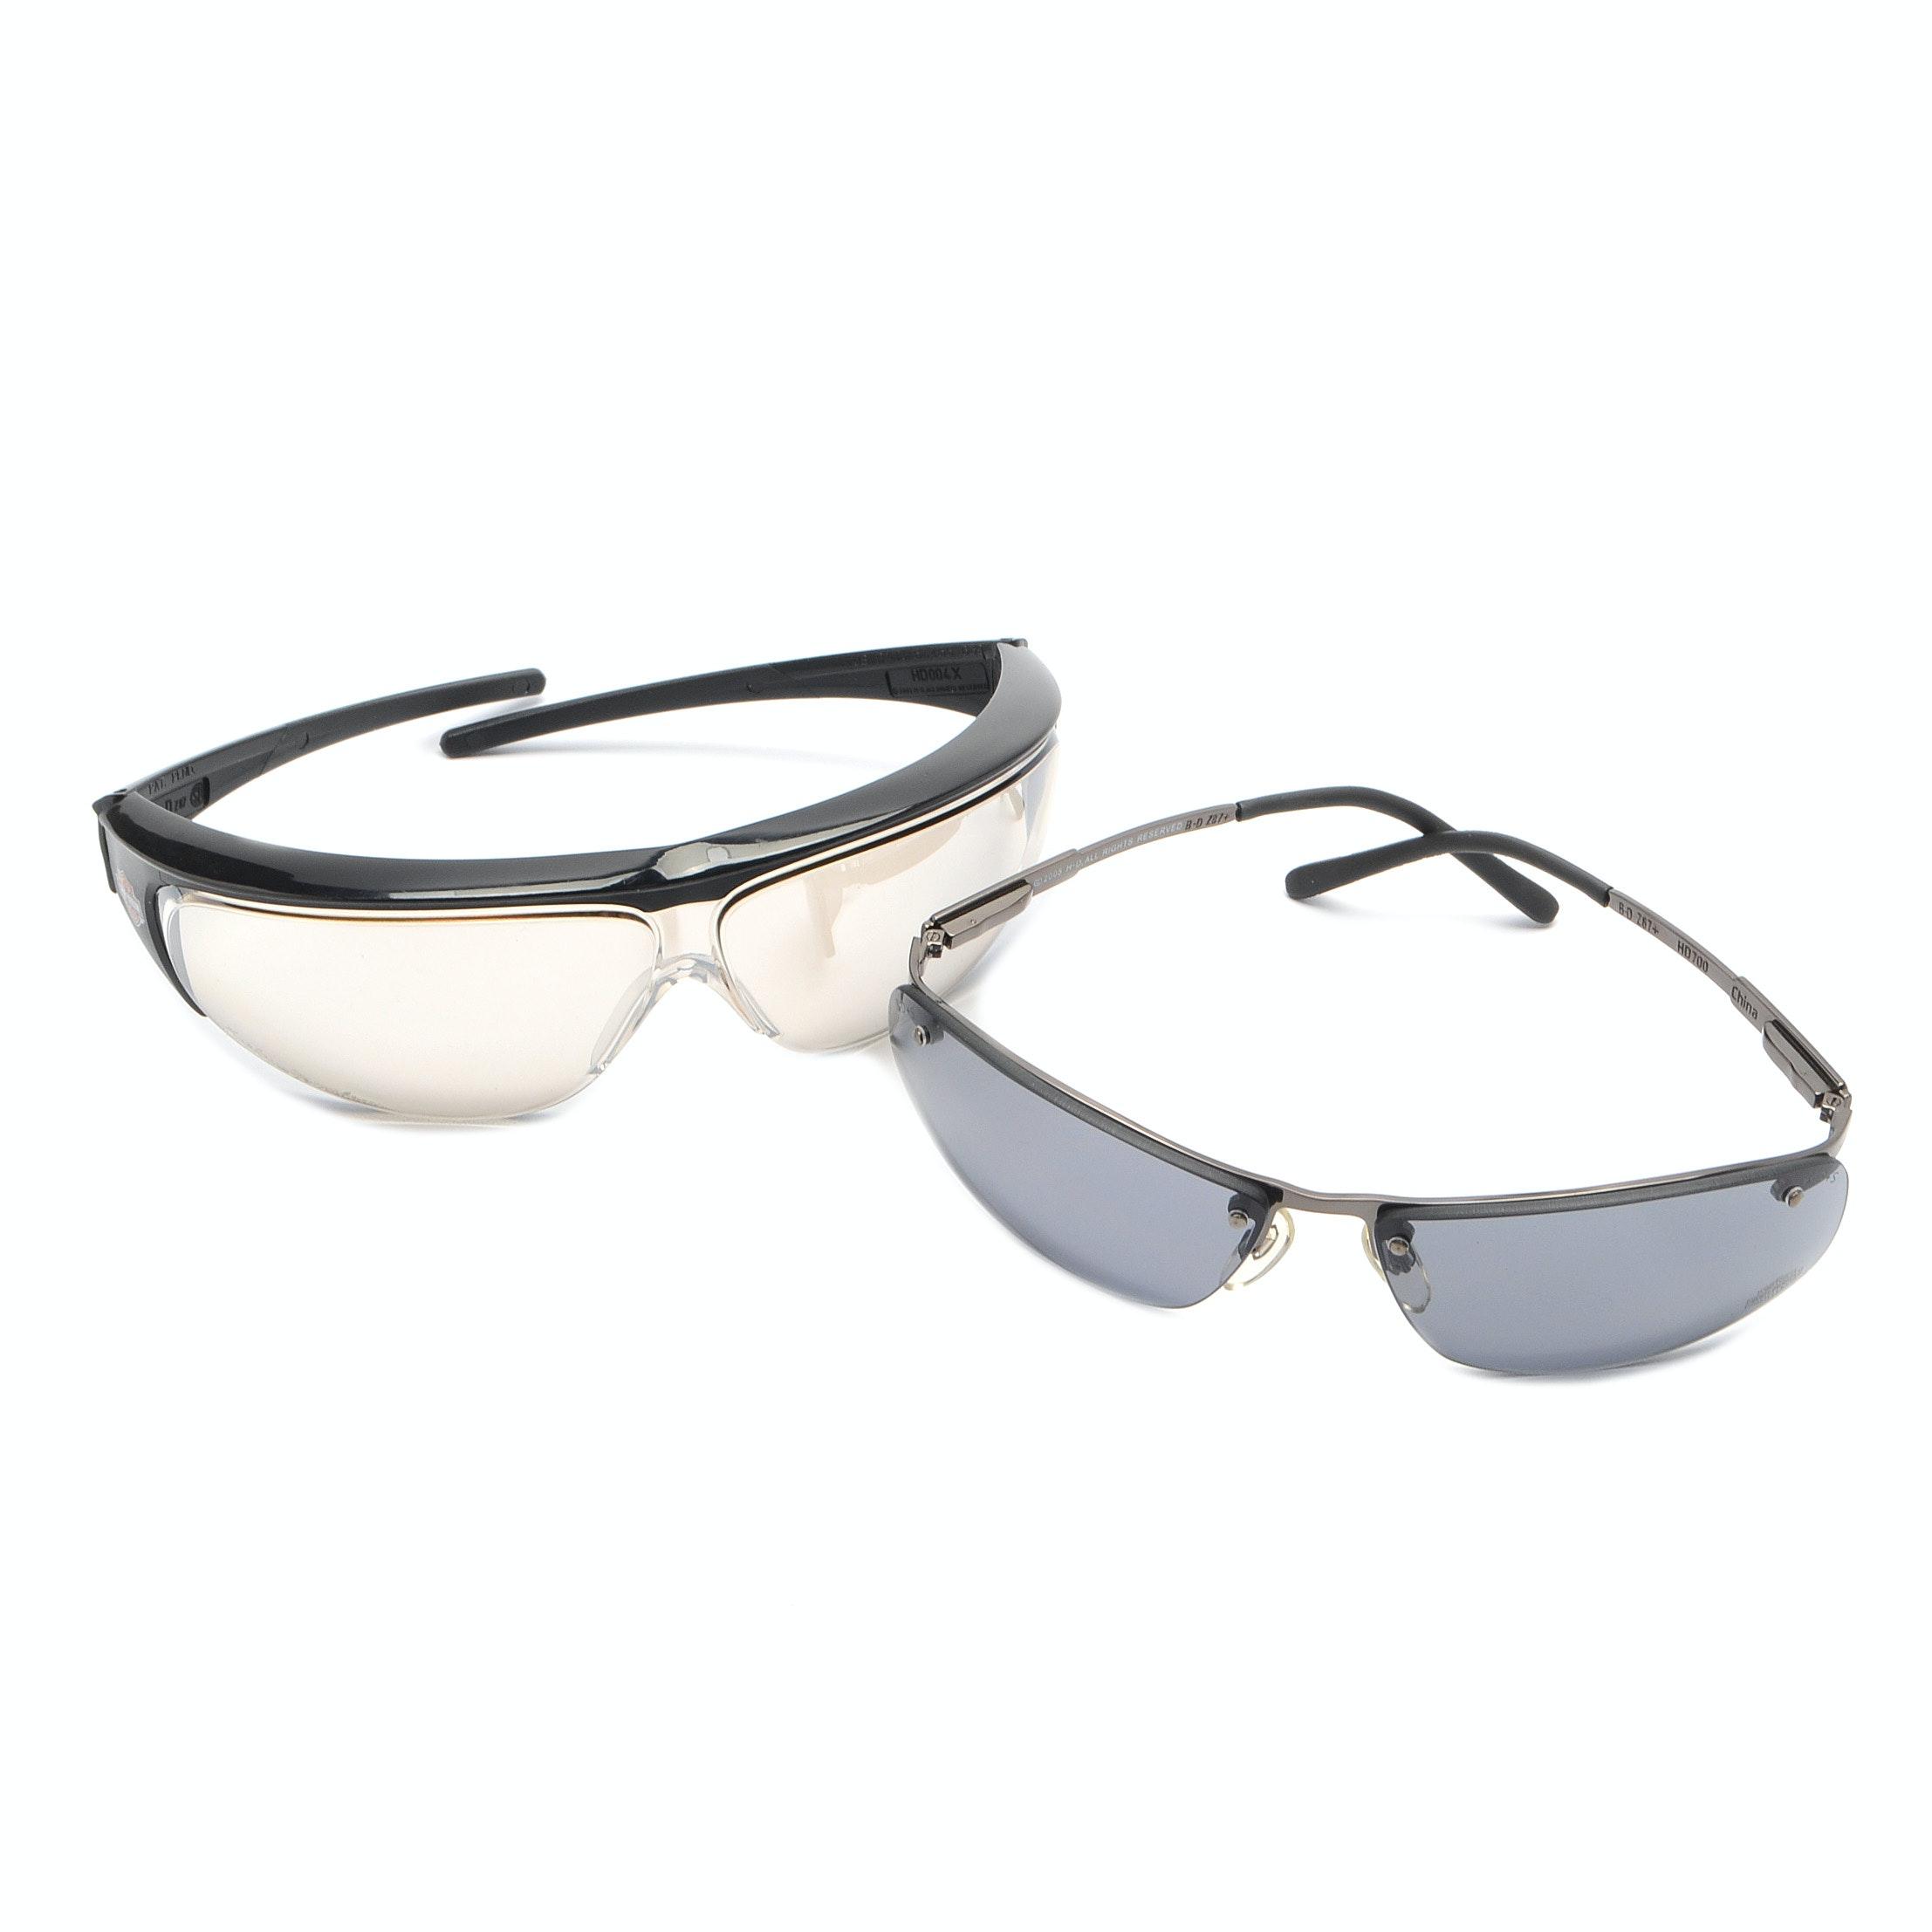 Harley-Davidson Safety Eyewear Sunglasses